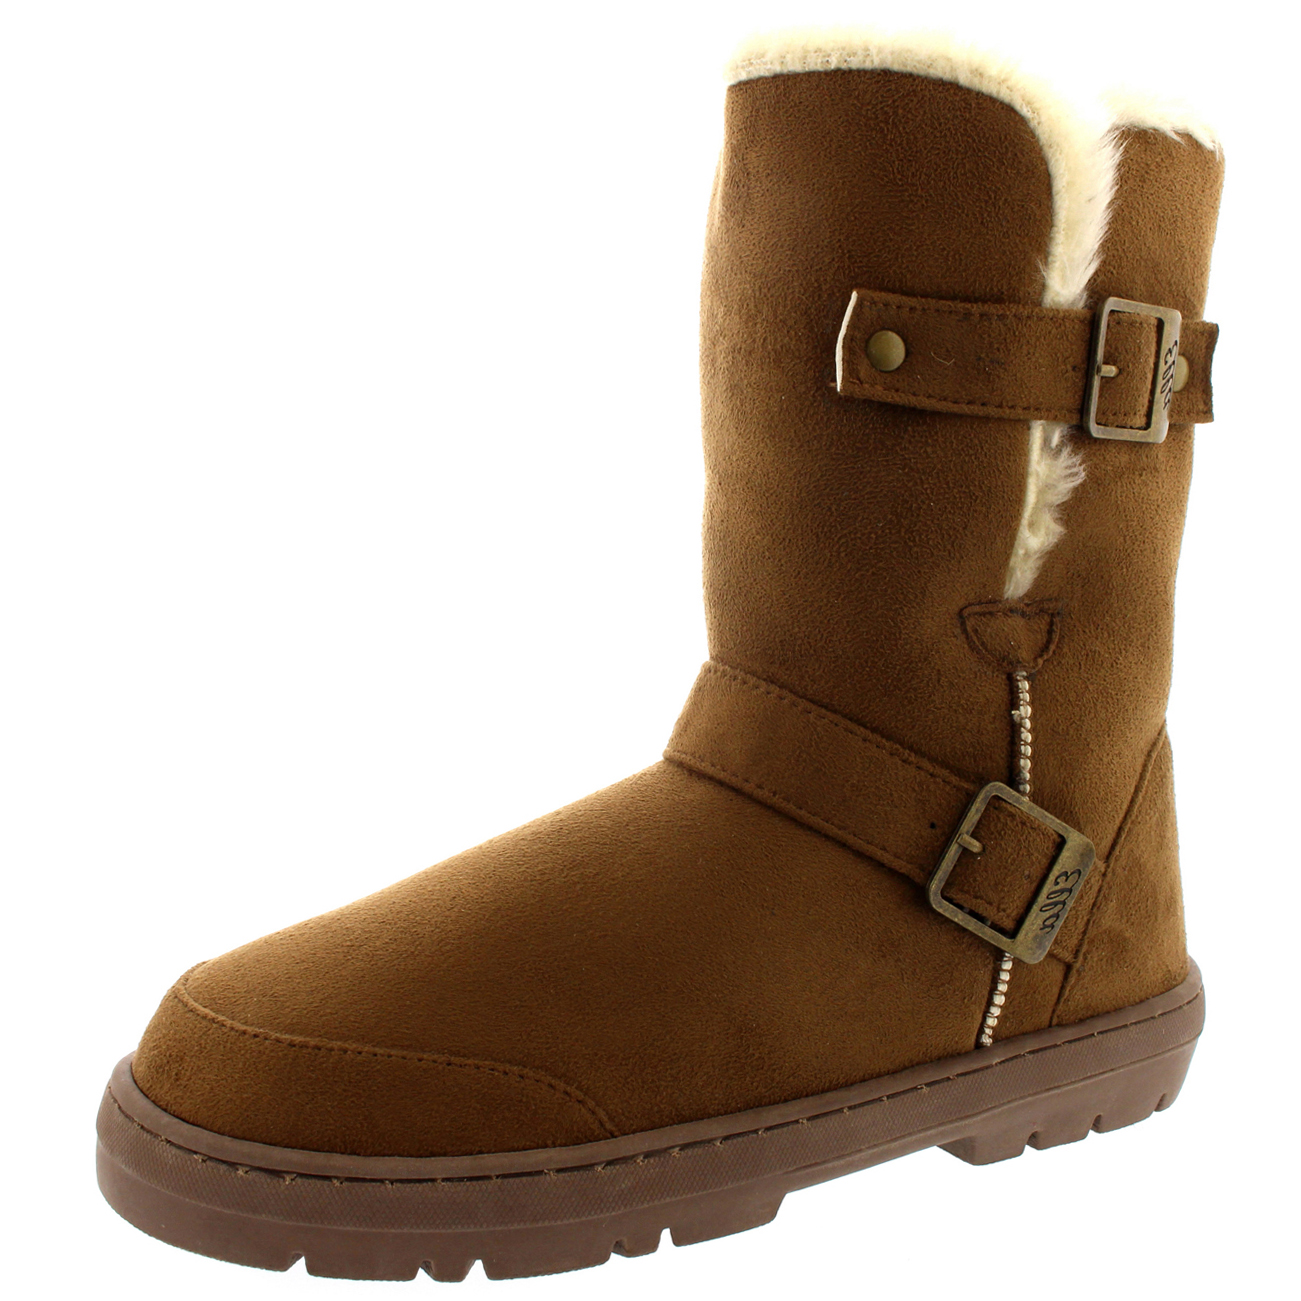 Amazing Premium Black Womens Short Winter Snow Warm Boots  EBay